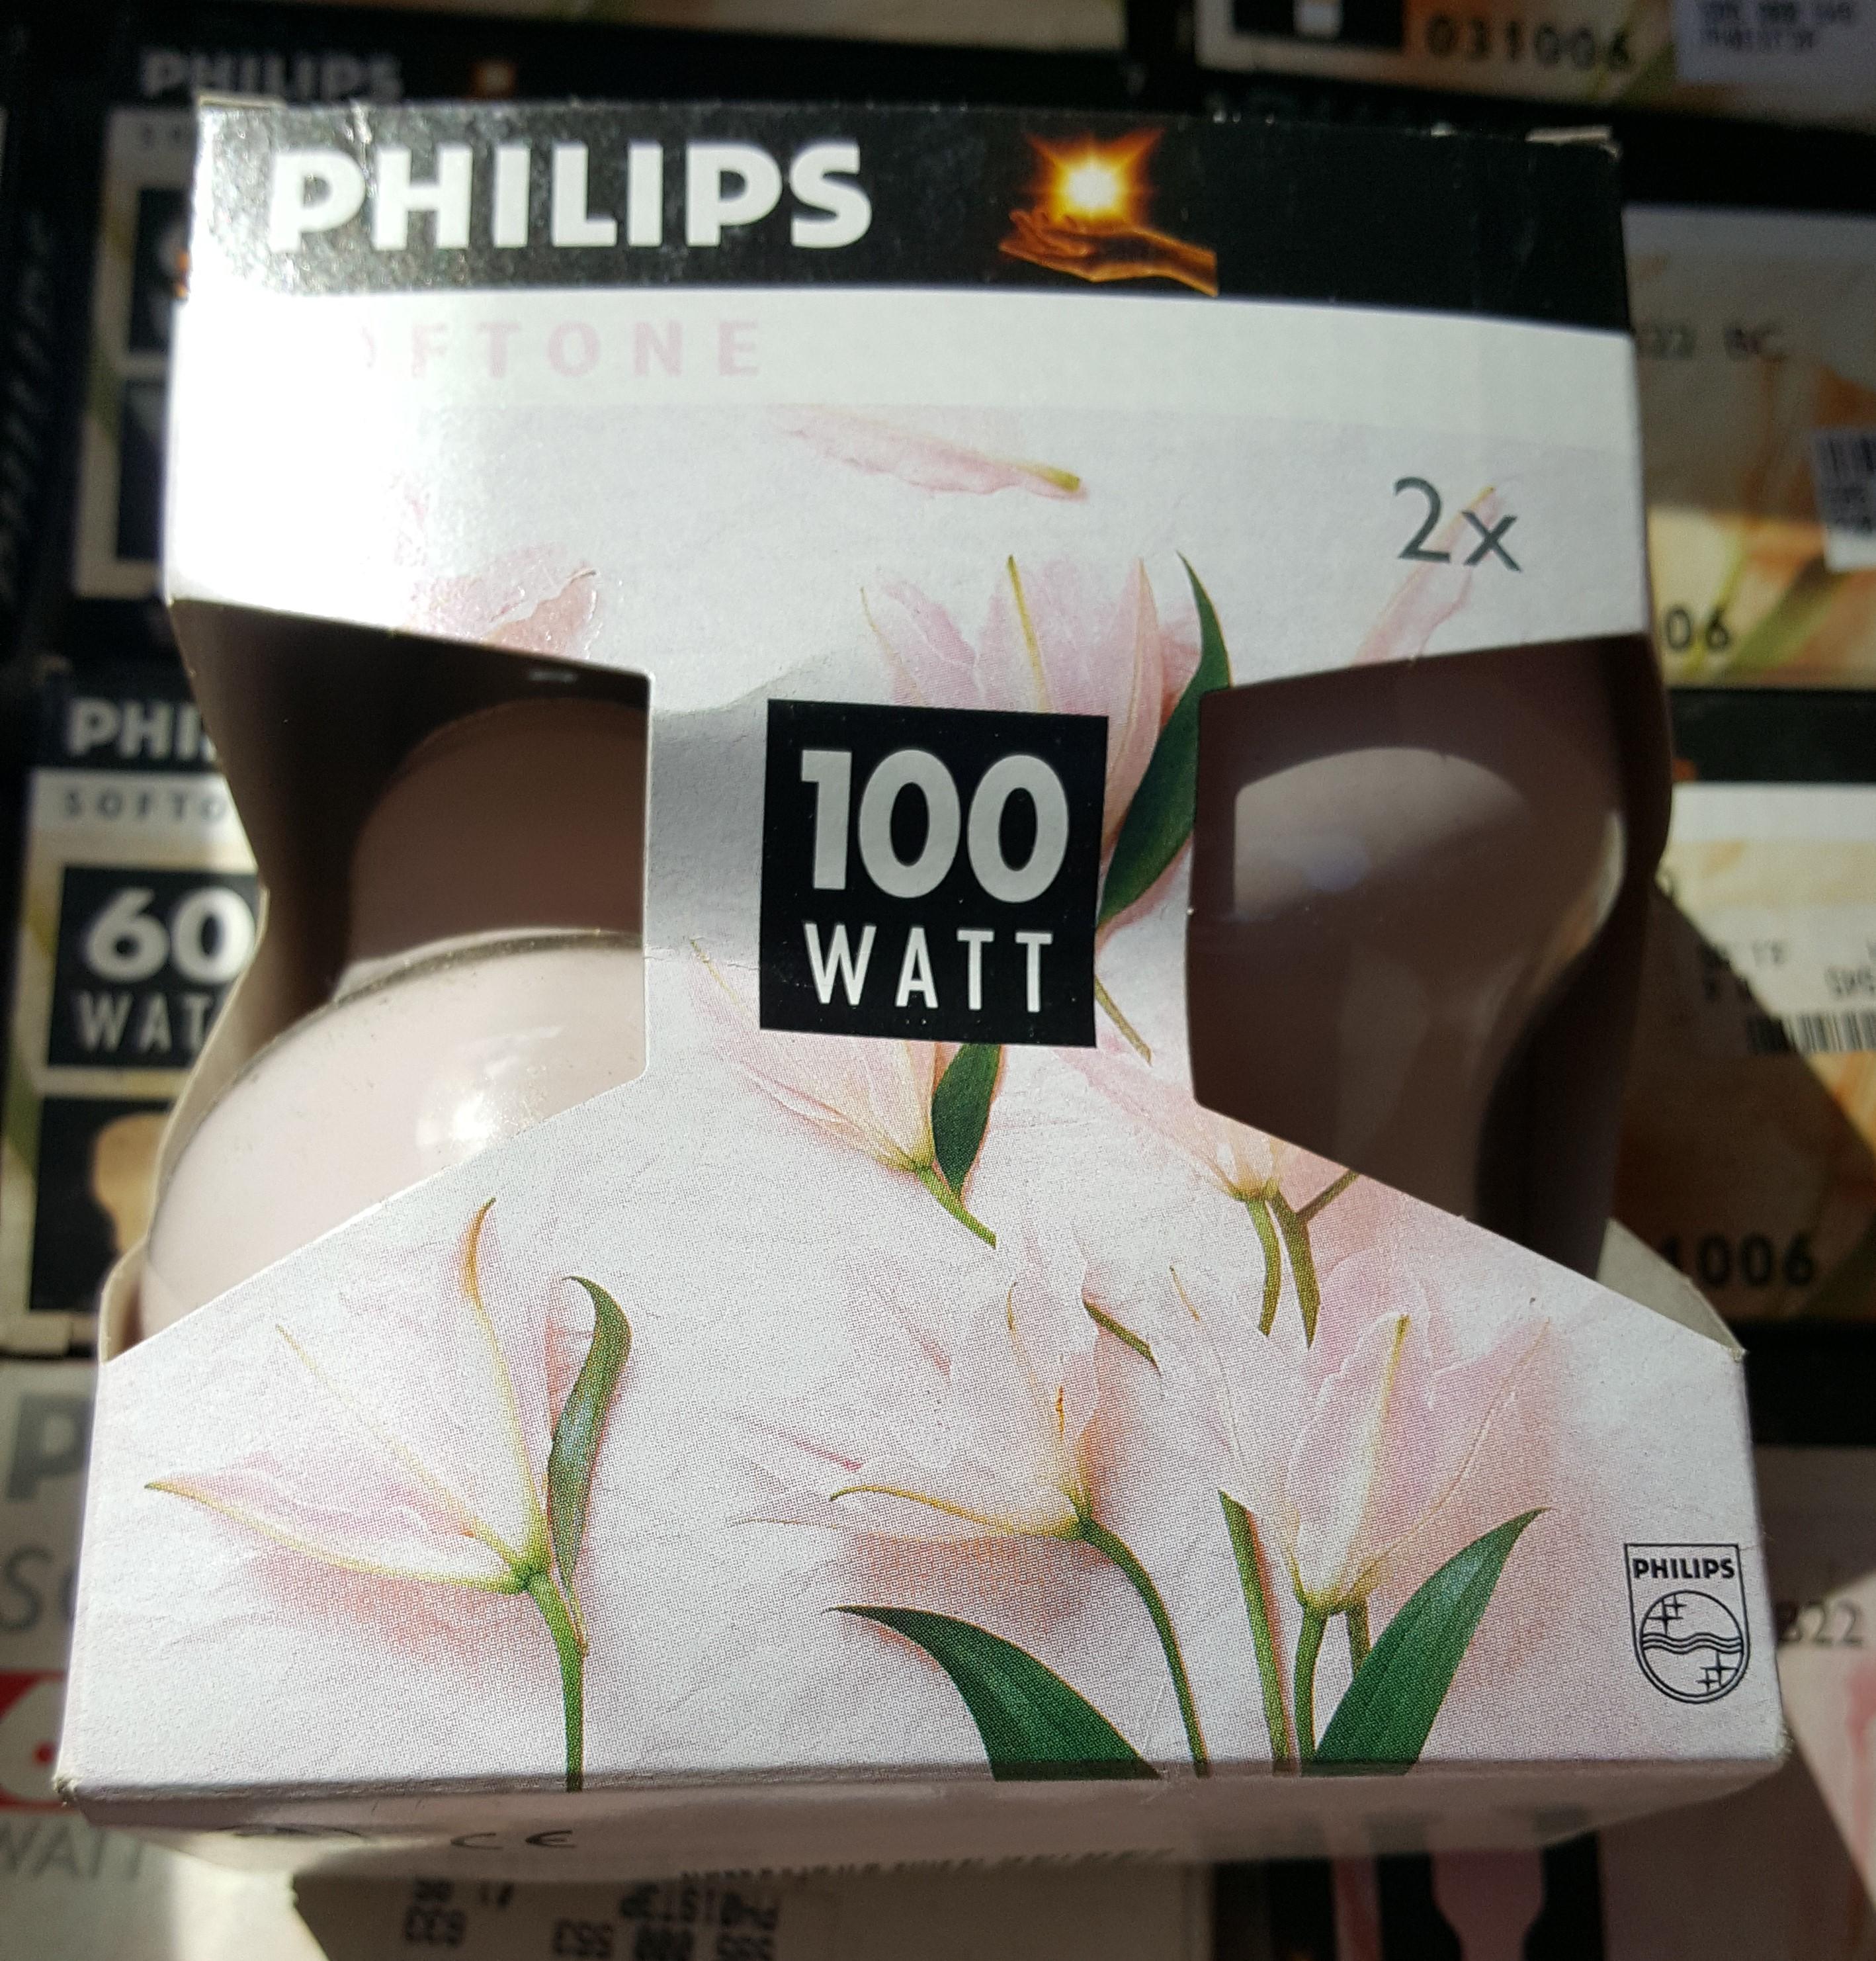 6 X 100 WATT Softone Light Bulbs BC / B22 CAP BY Philips